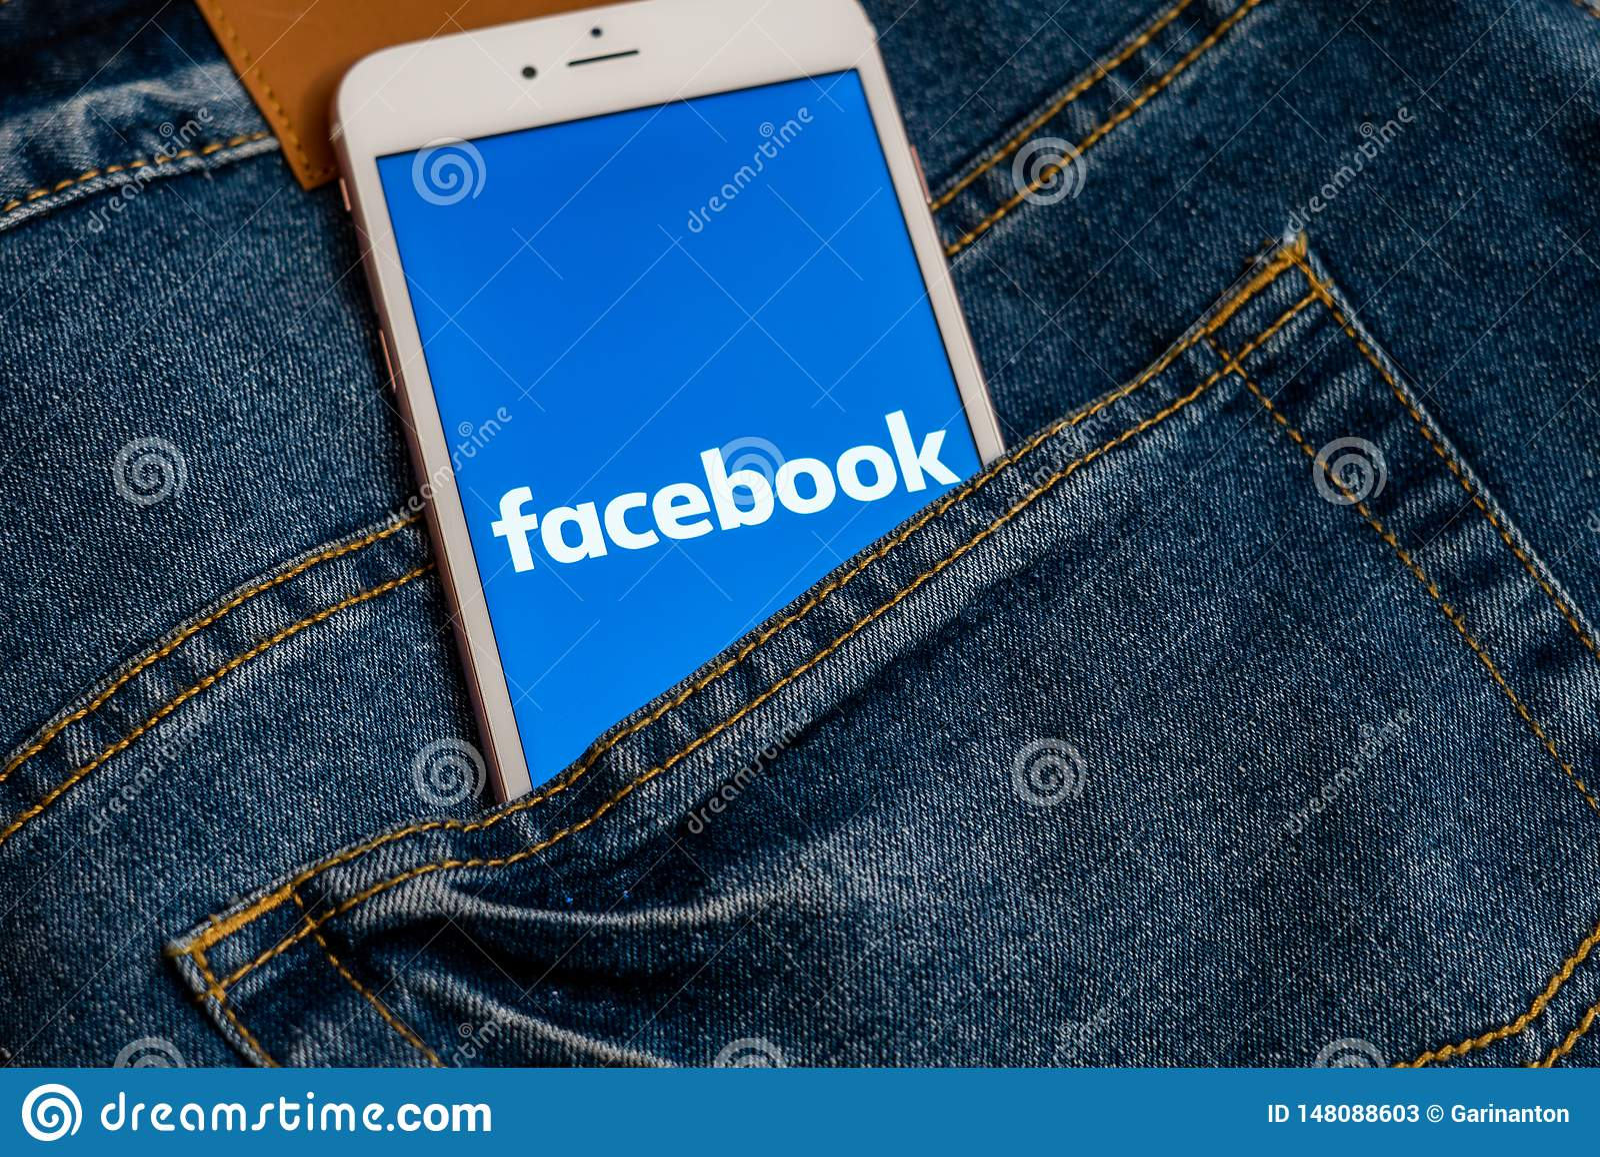 Bia?y iPhone z logo og?lnospo?eczny medialny Facebook na ekranie Og?lnospo?eczna medialna ikona